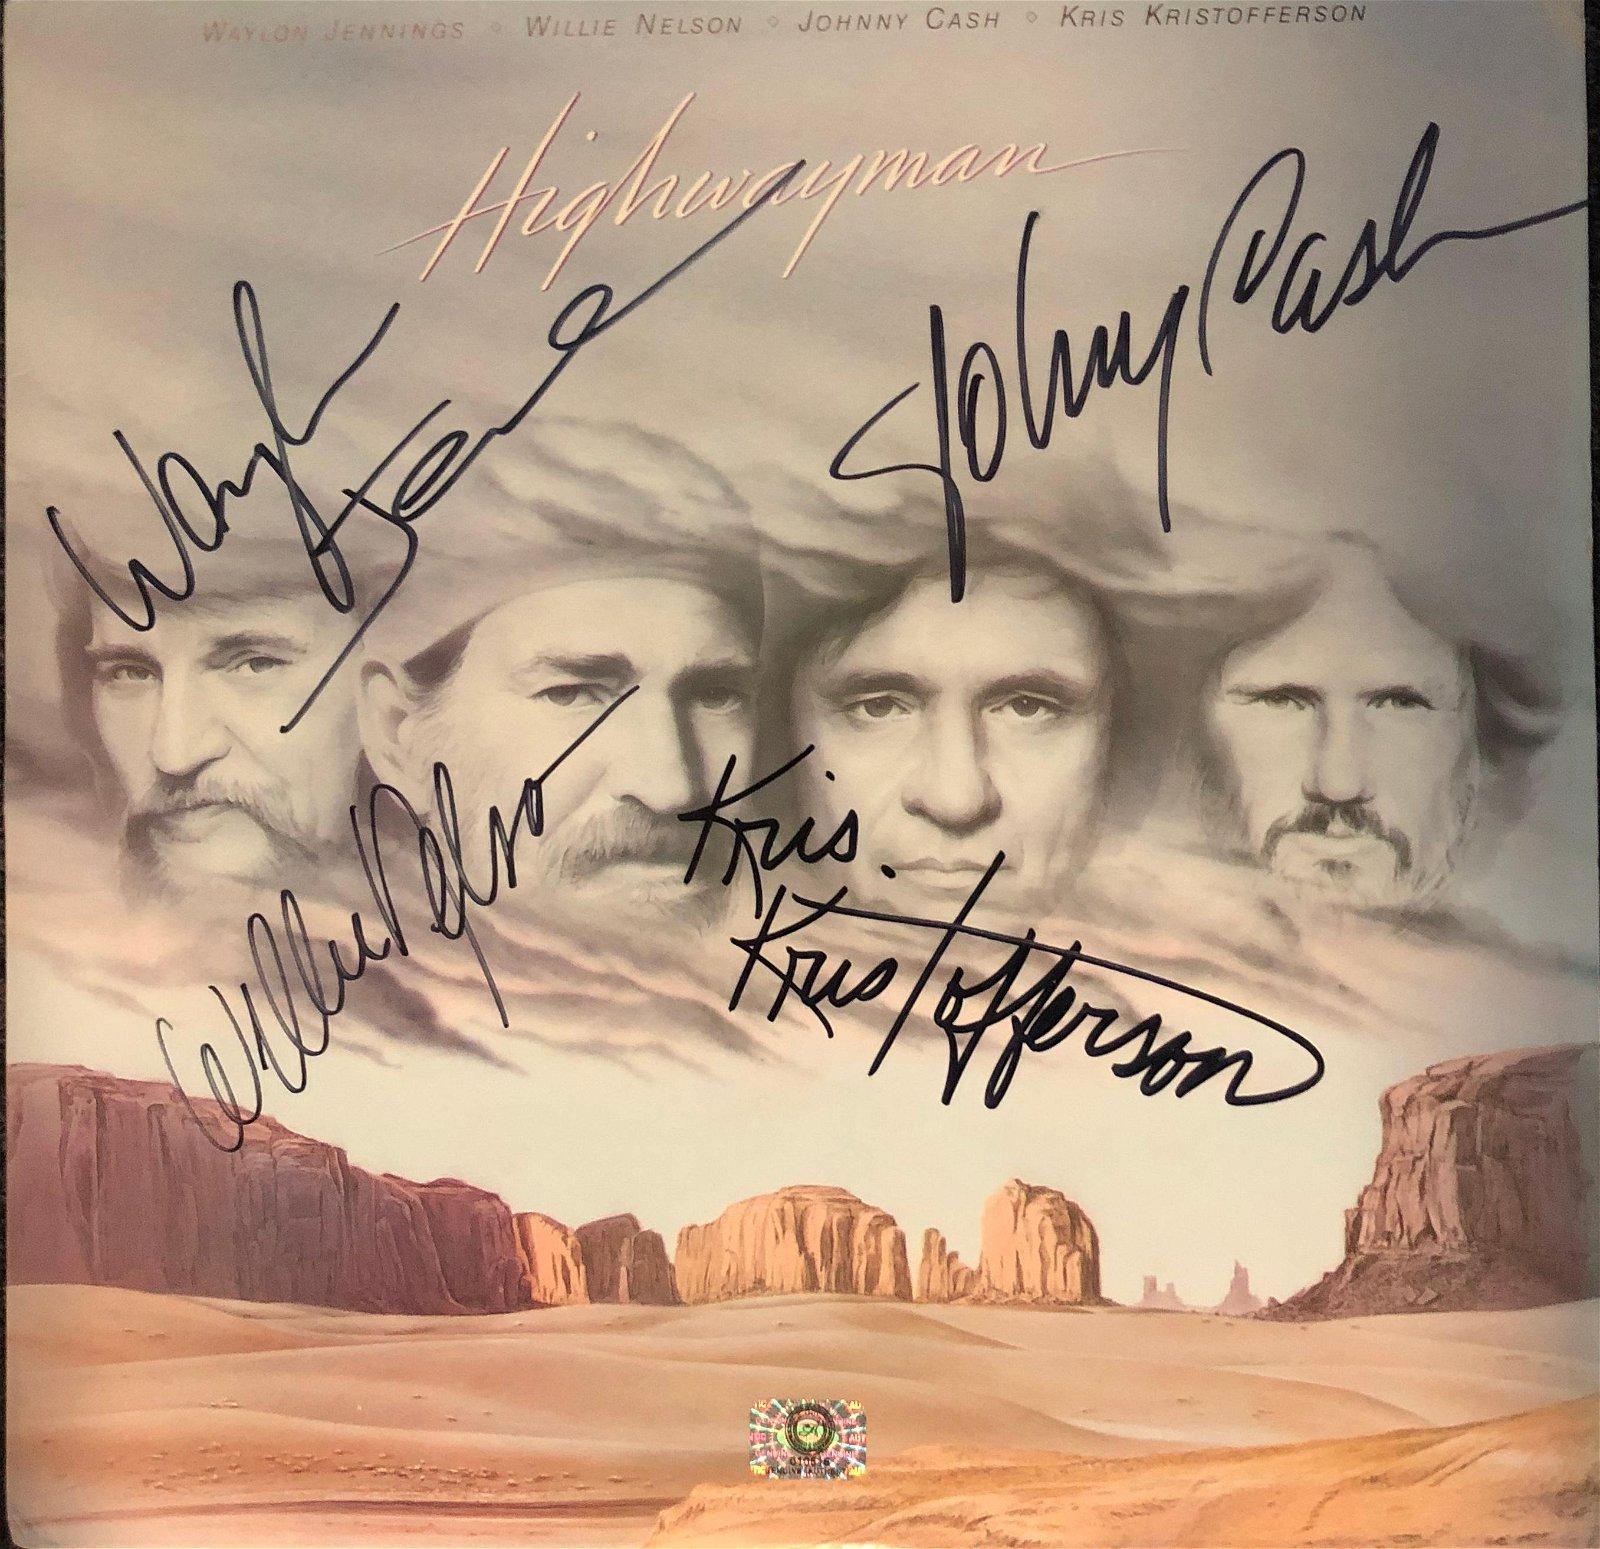 The Highwaymen Signed Self-Titled Album